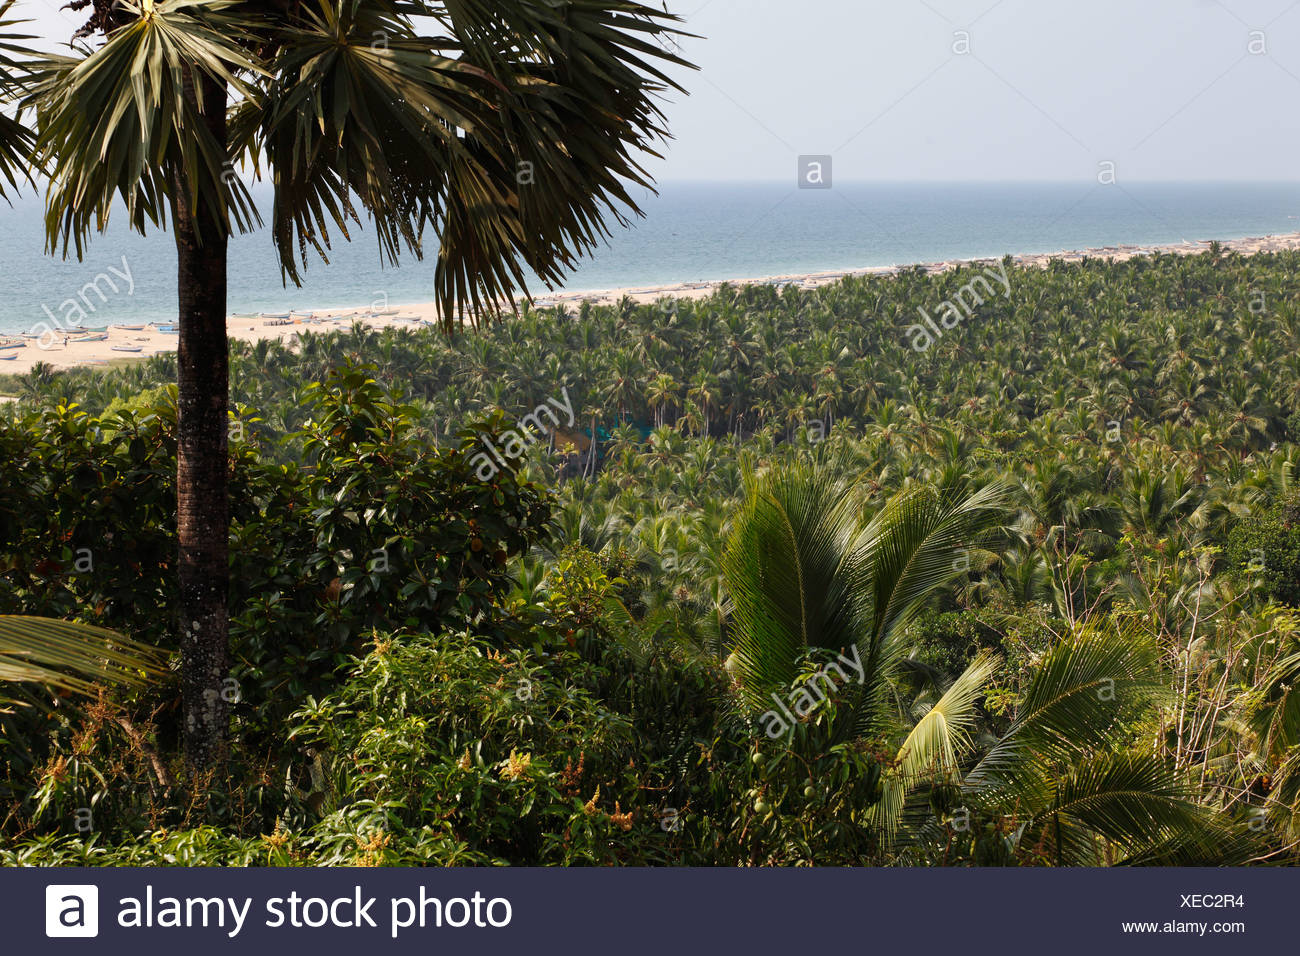 Forest of coconut palms at Somatheeram Beach, Malabarian Coast, south of Kovalam, Malabar, Kerala state, India, Asia - Stock Image